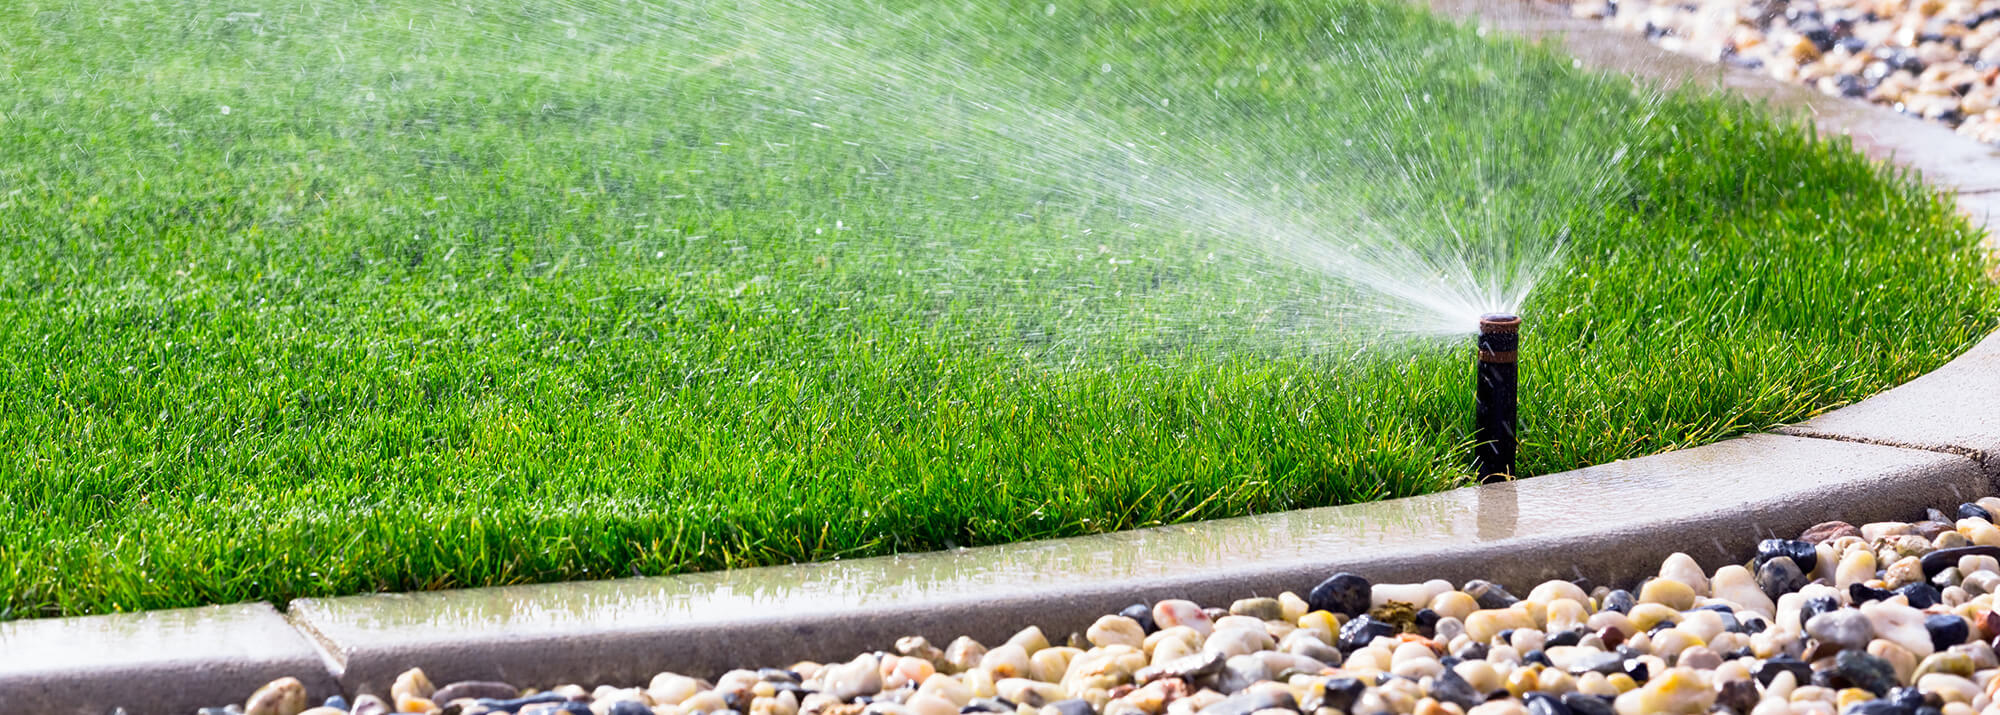 Sprinker System Watering Lawn